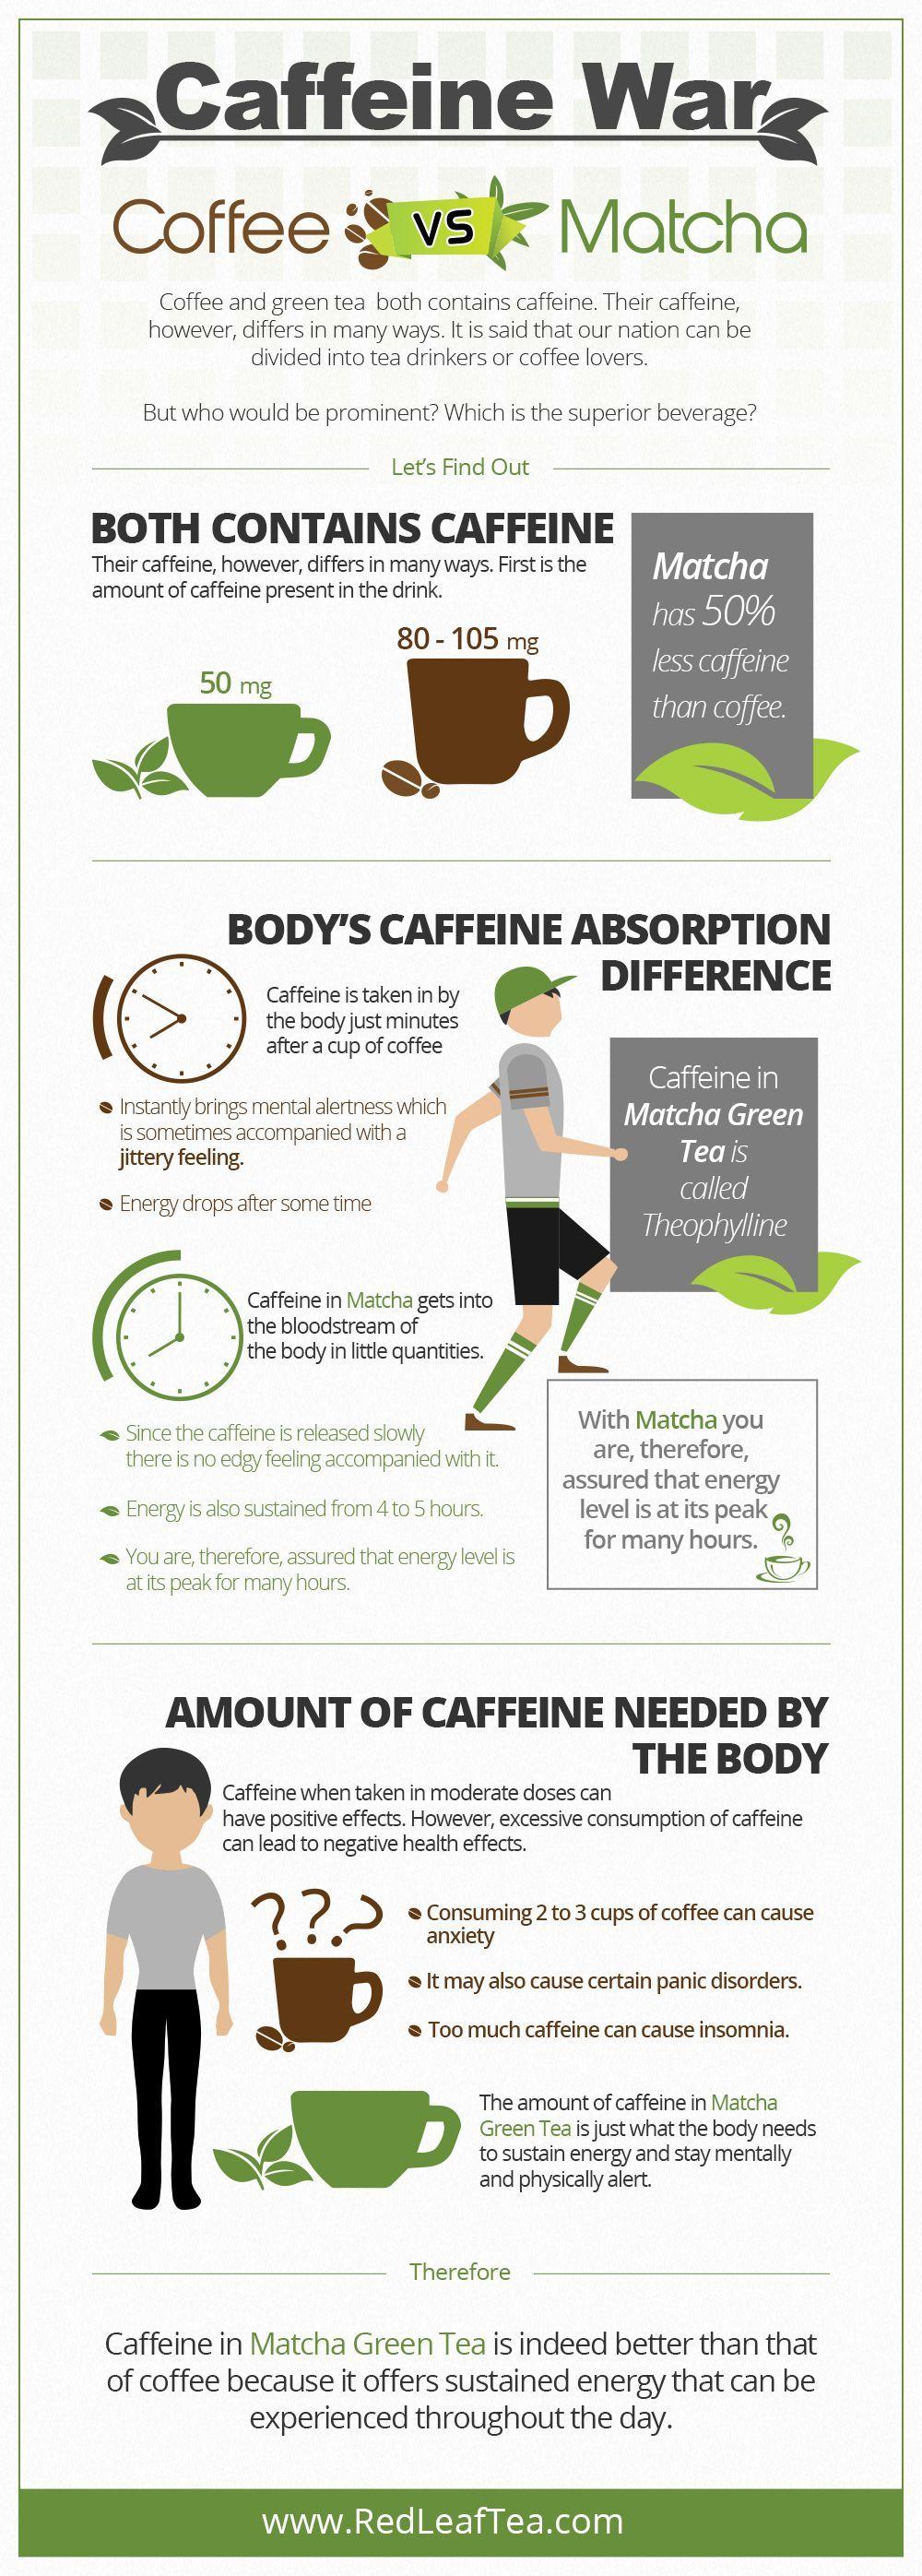 Wwwredleafteacom Caffeine Coffee Matcha War Vscaffeine War Coffee Vs Matcha Matcha Vs Coffee Green Tea Vs Coffee Matcha